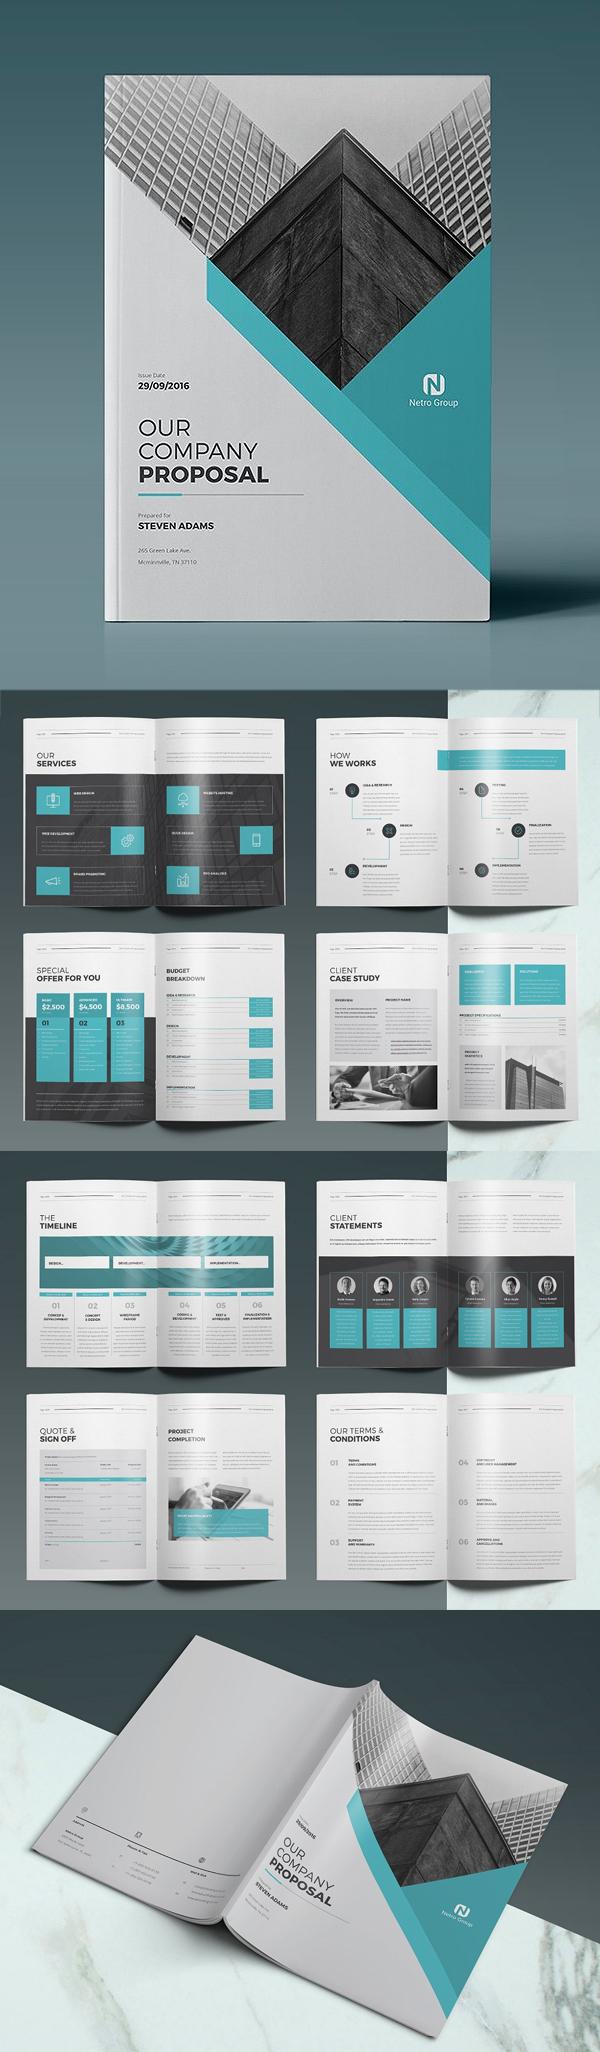 Professional Business Proposal Templates Design - 4